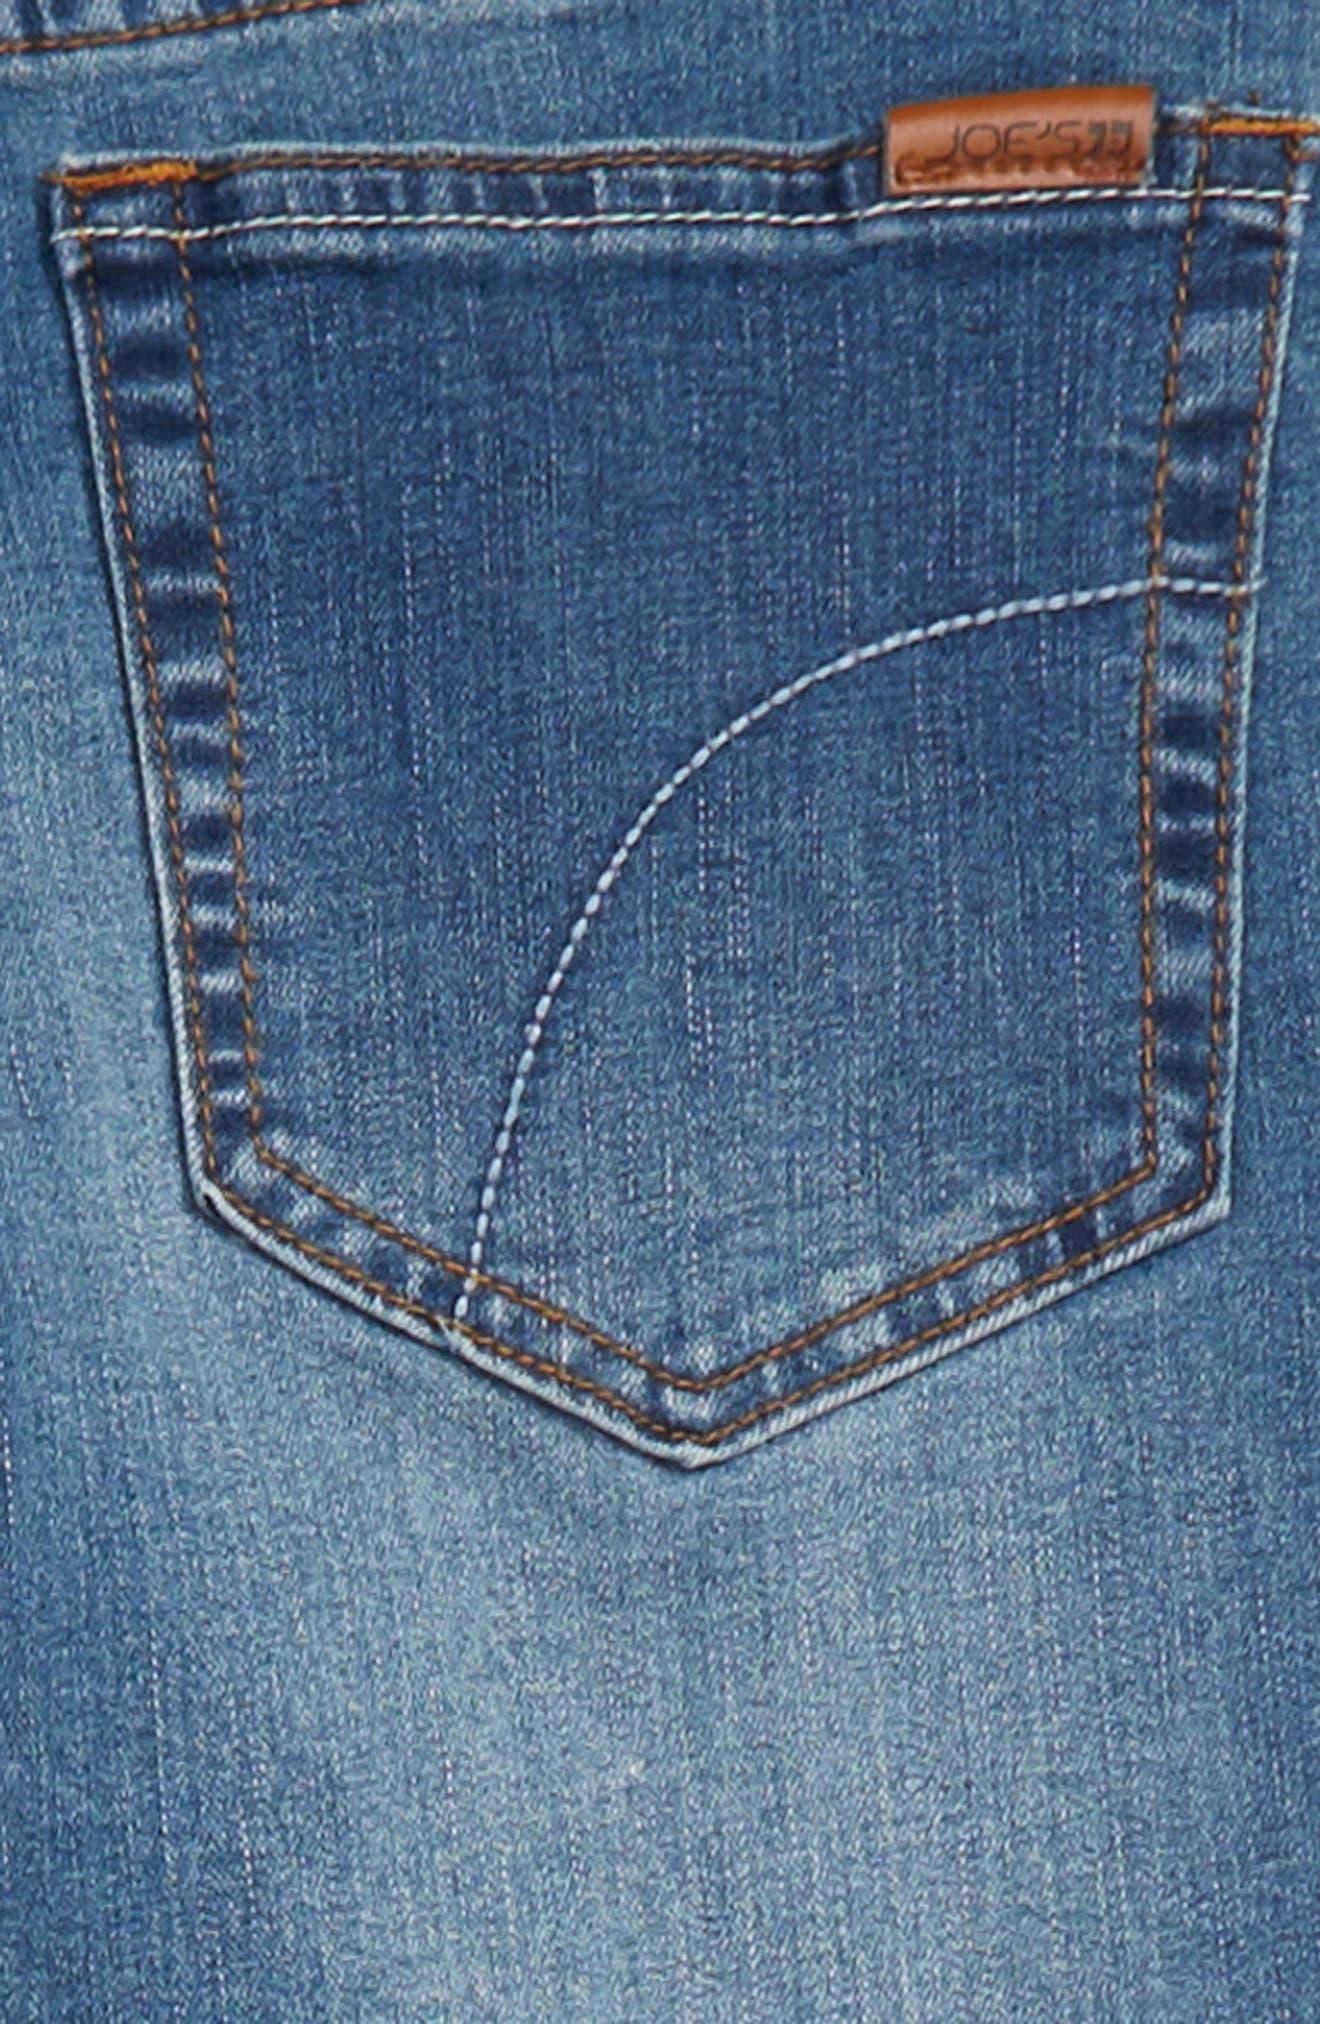 Brixton Stretch Jeans,                             Alternate thumbnail 3, color,                             DRESDEN BLUE